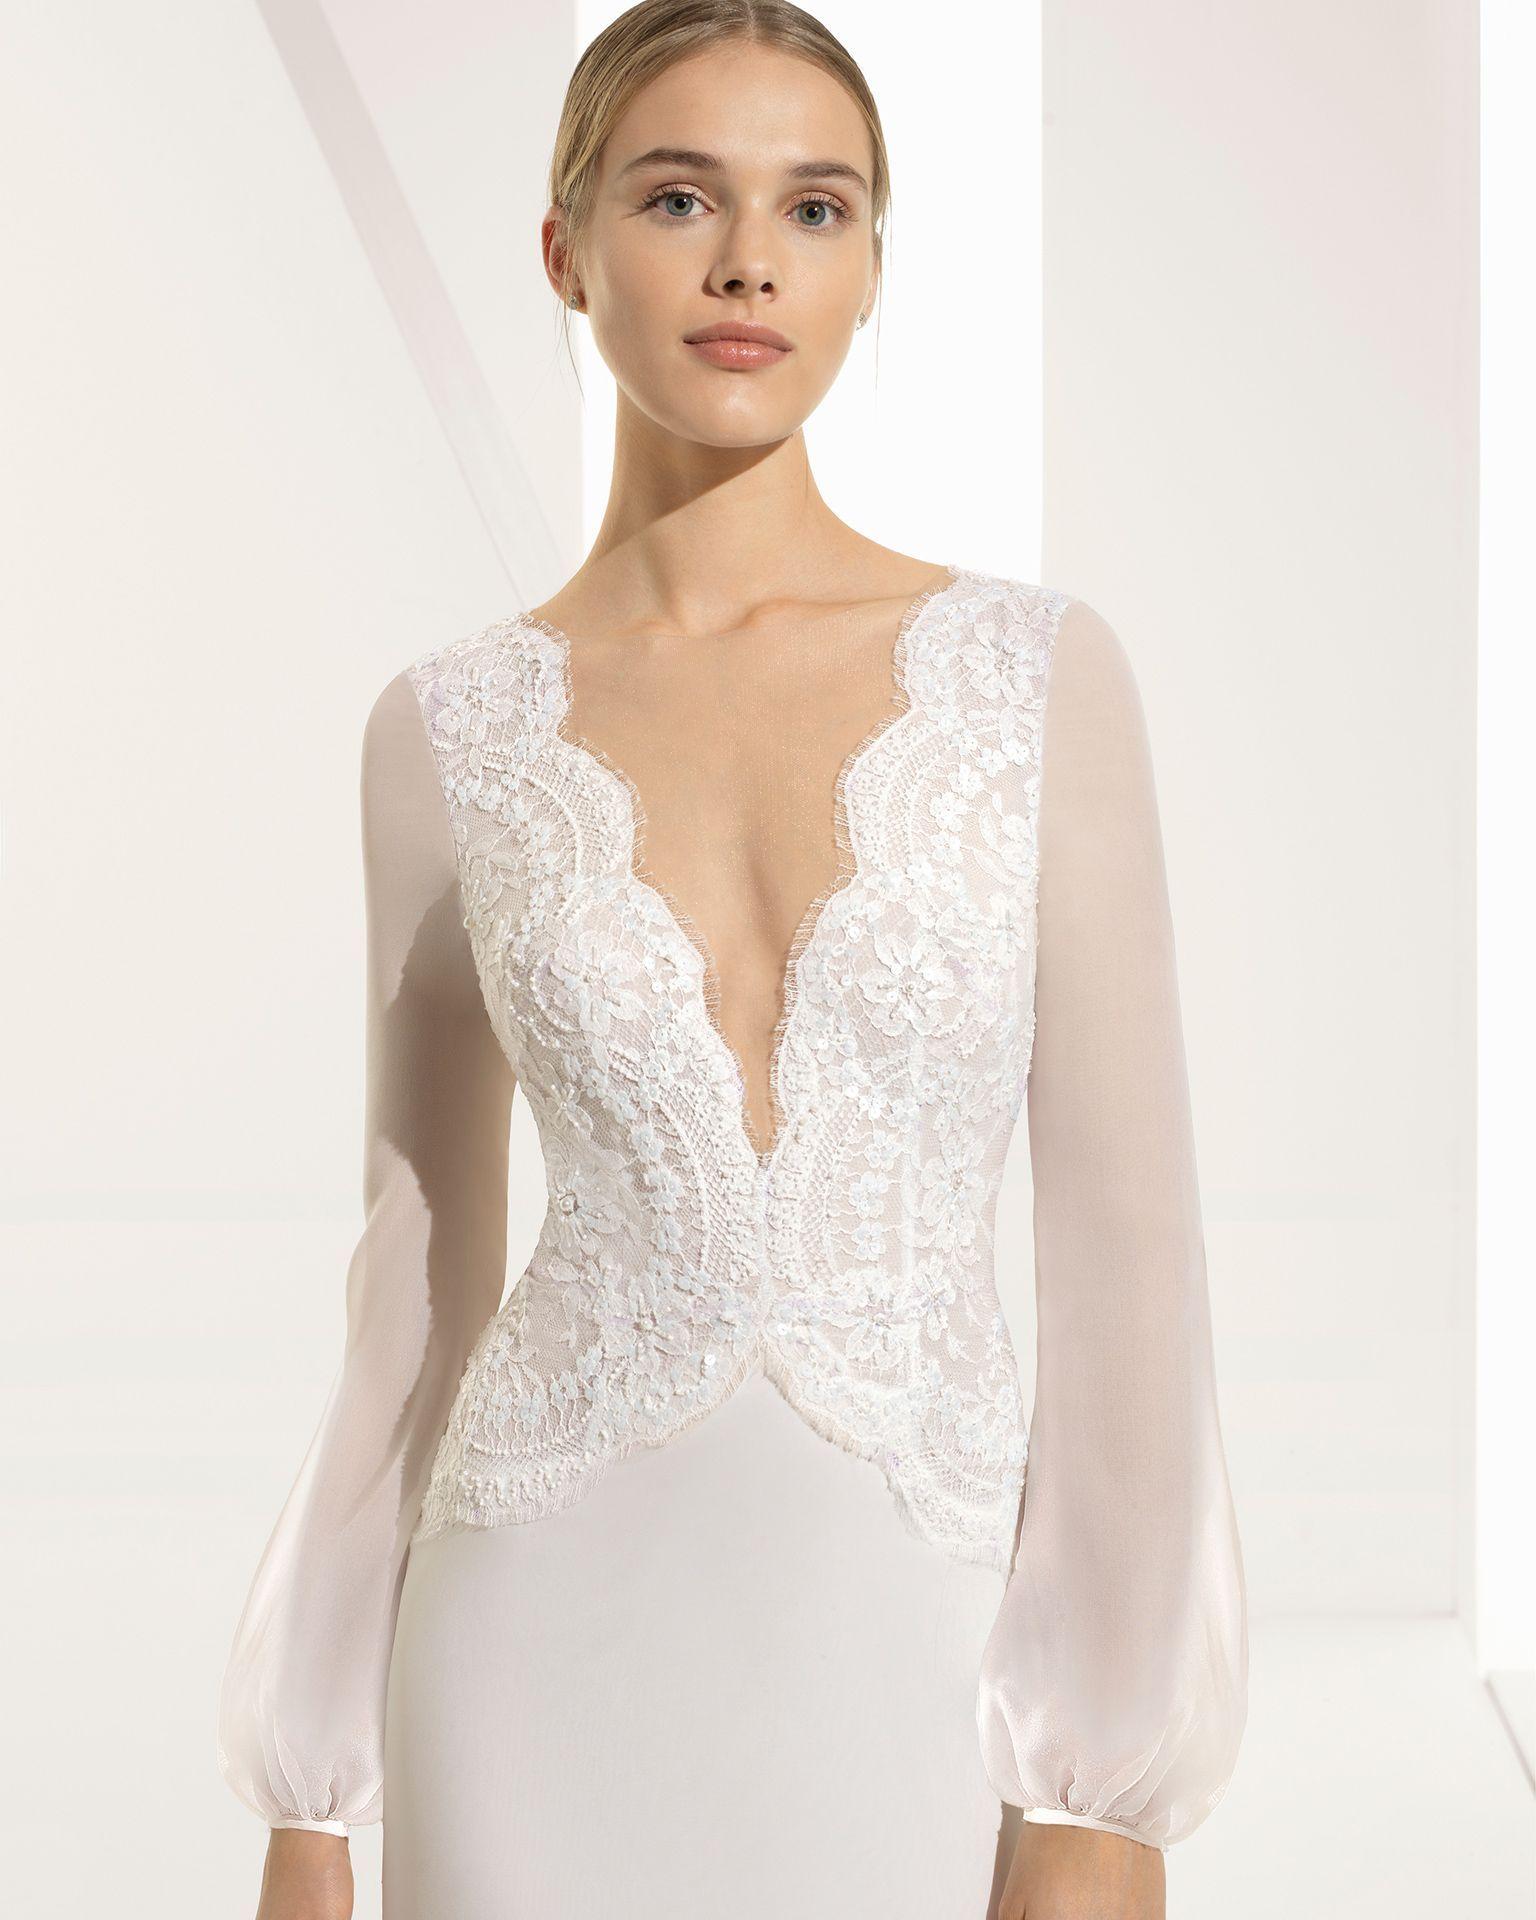 Long sleeve chiffon wedding dress  Ballgownstyle beaded lace and silk chiffon wedding dress with long